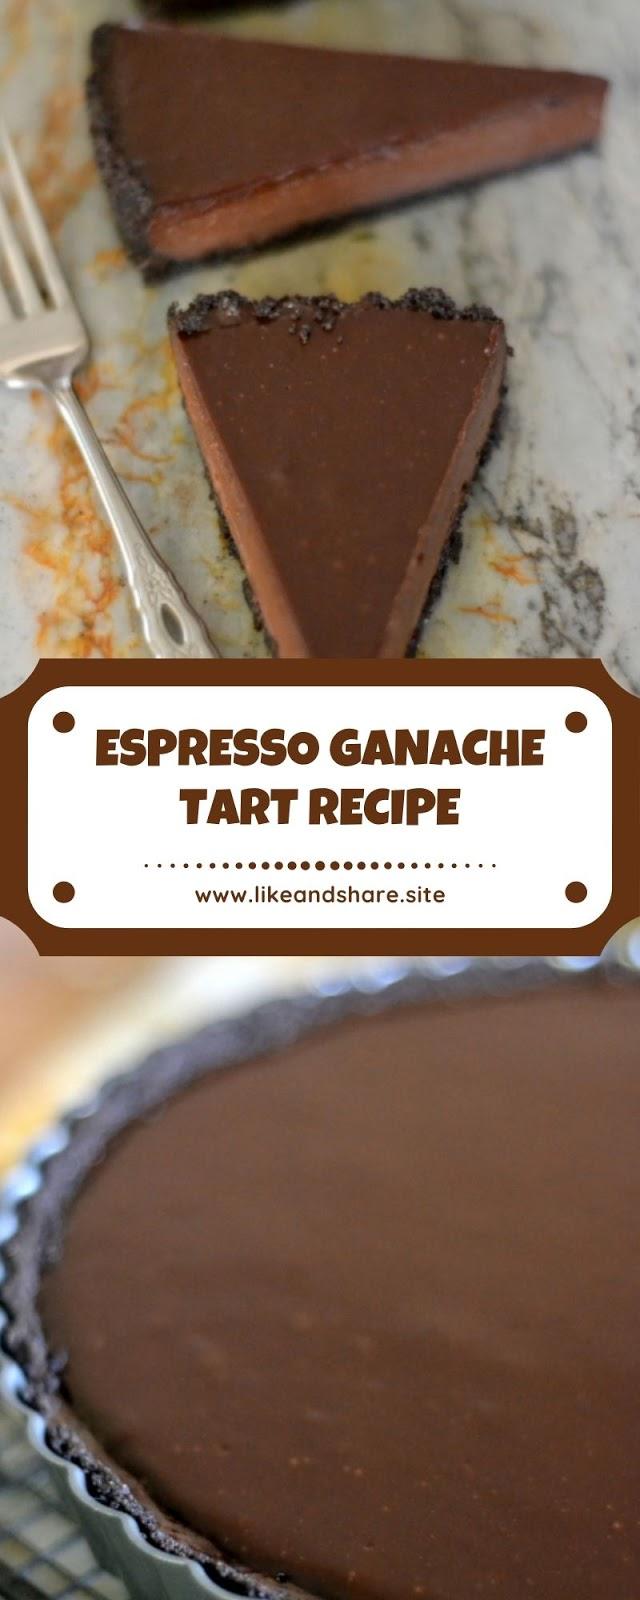 ESPRESSO GANACHE TART RECIPE